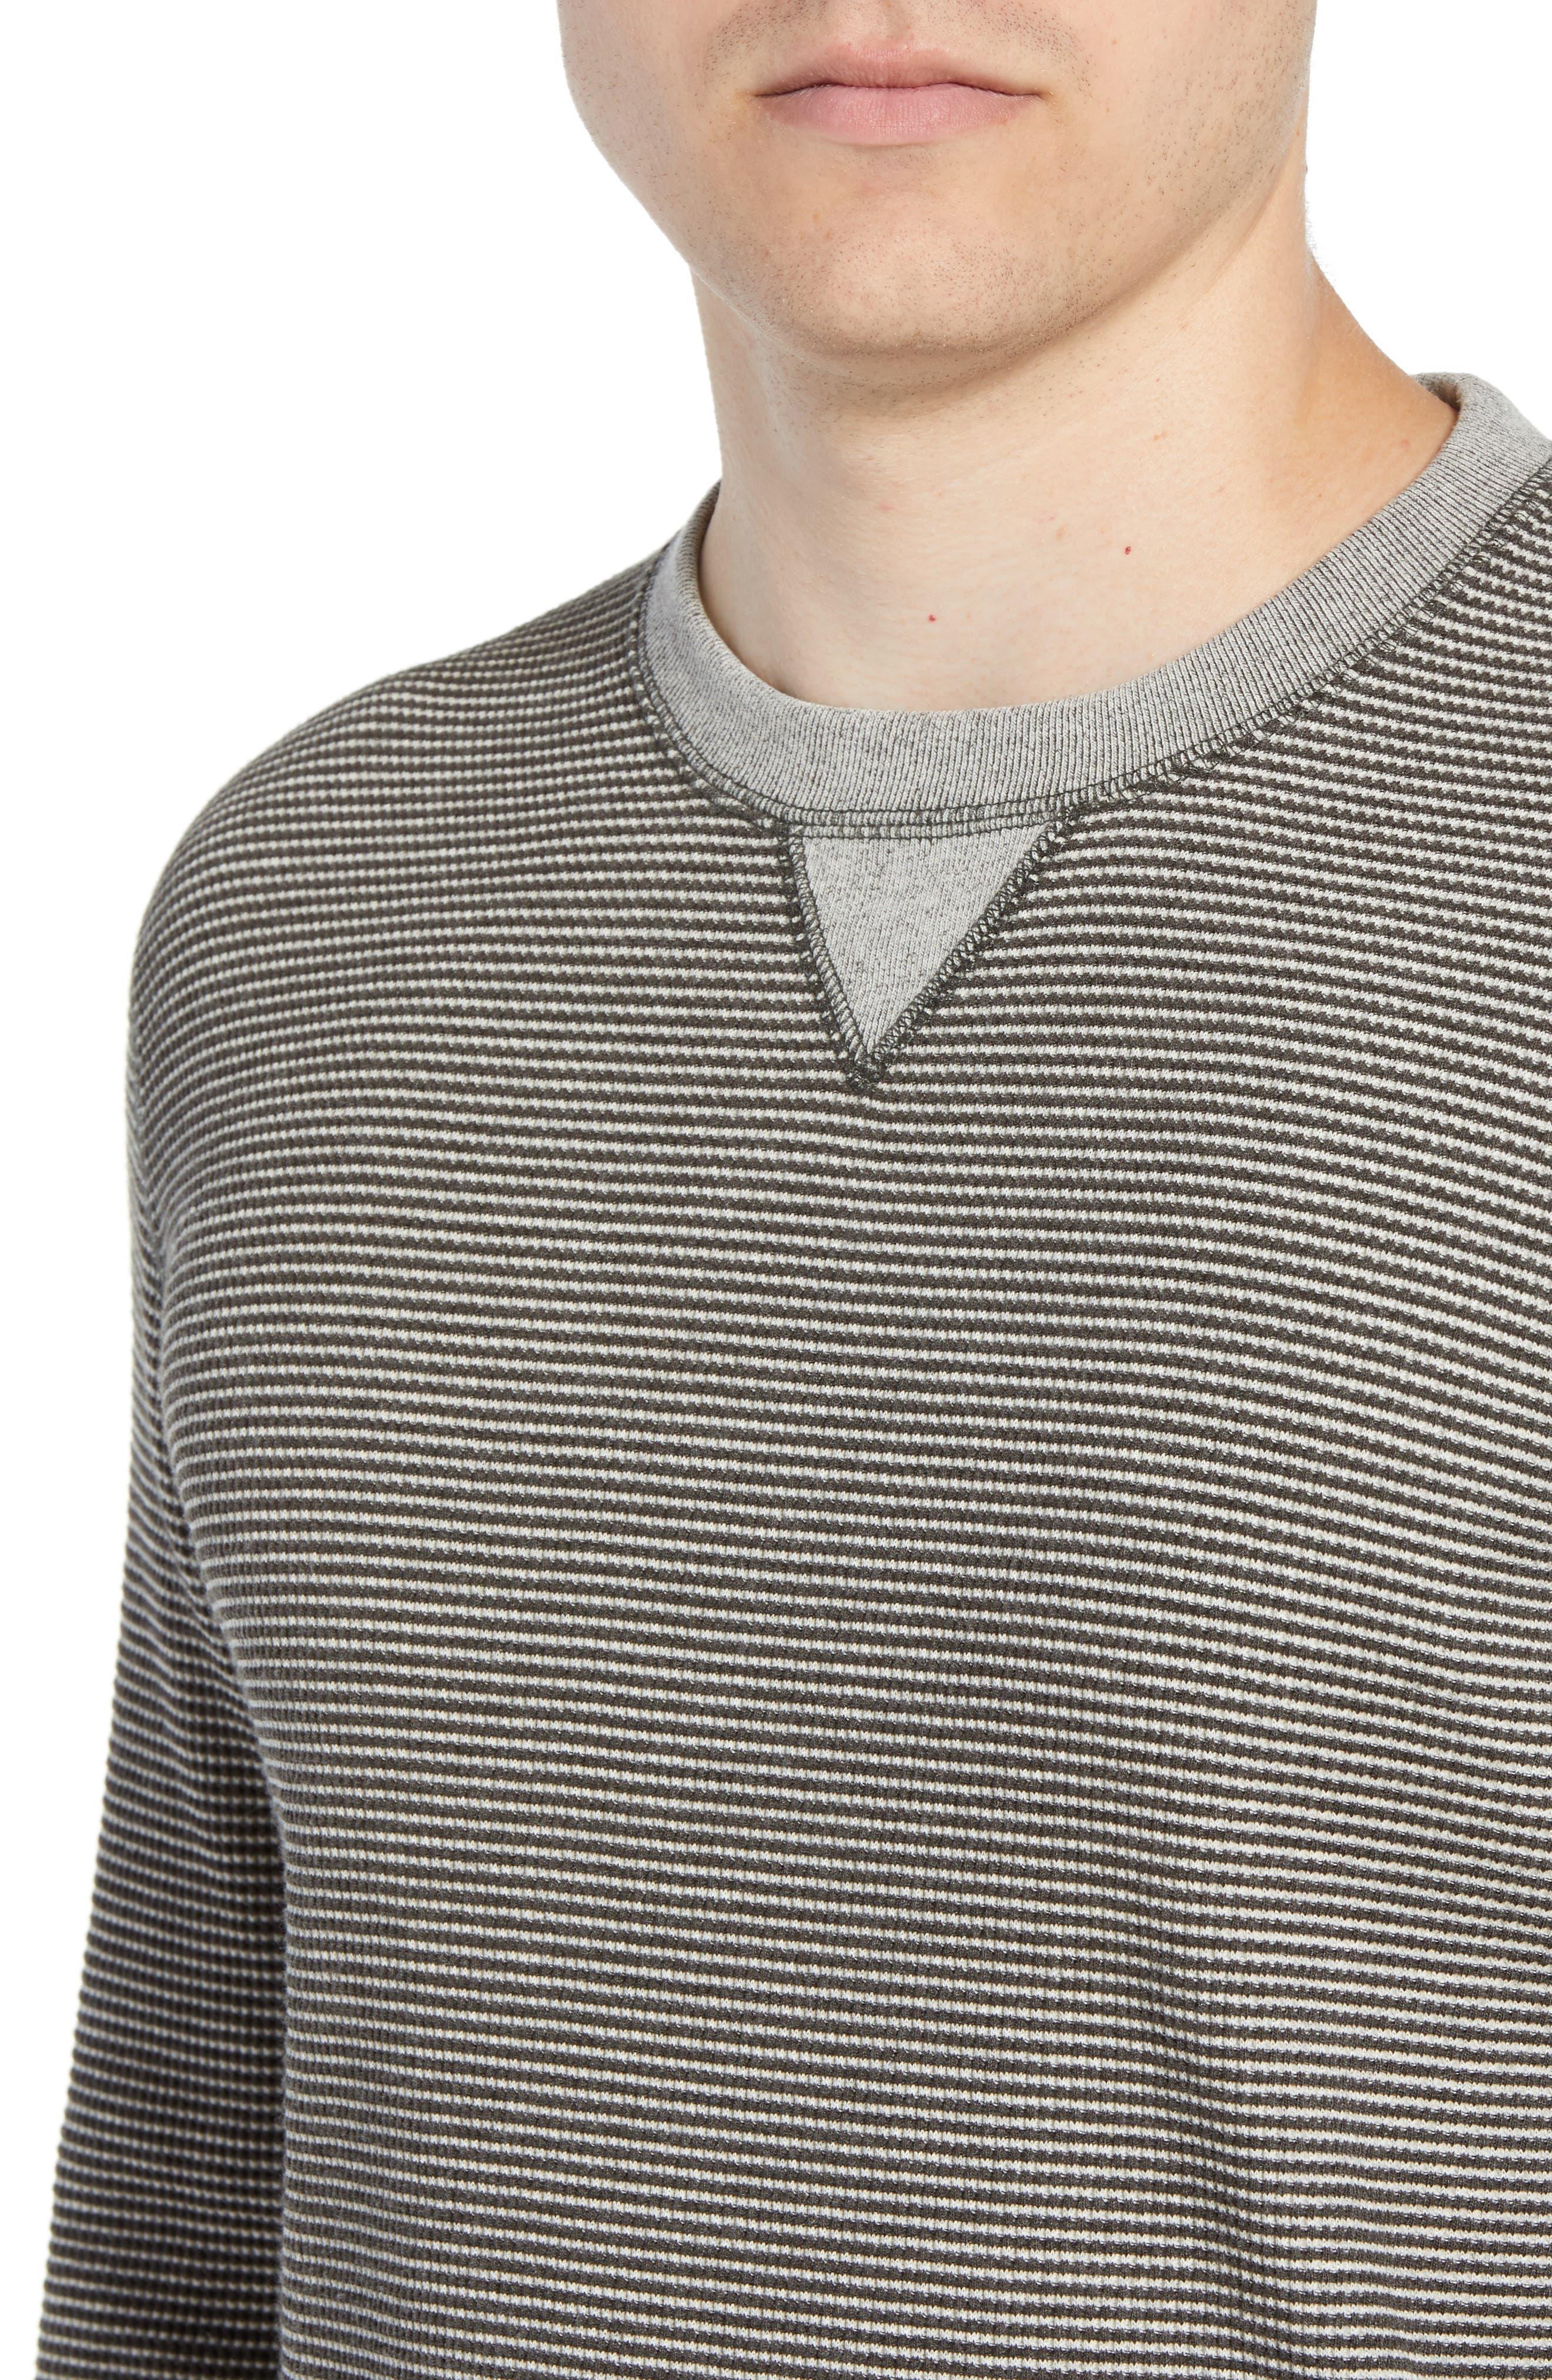 Regular Fit Waffle Crewneck Sweatshirt,                             Alternate thumbnail 4, color,                             CHARCOAL